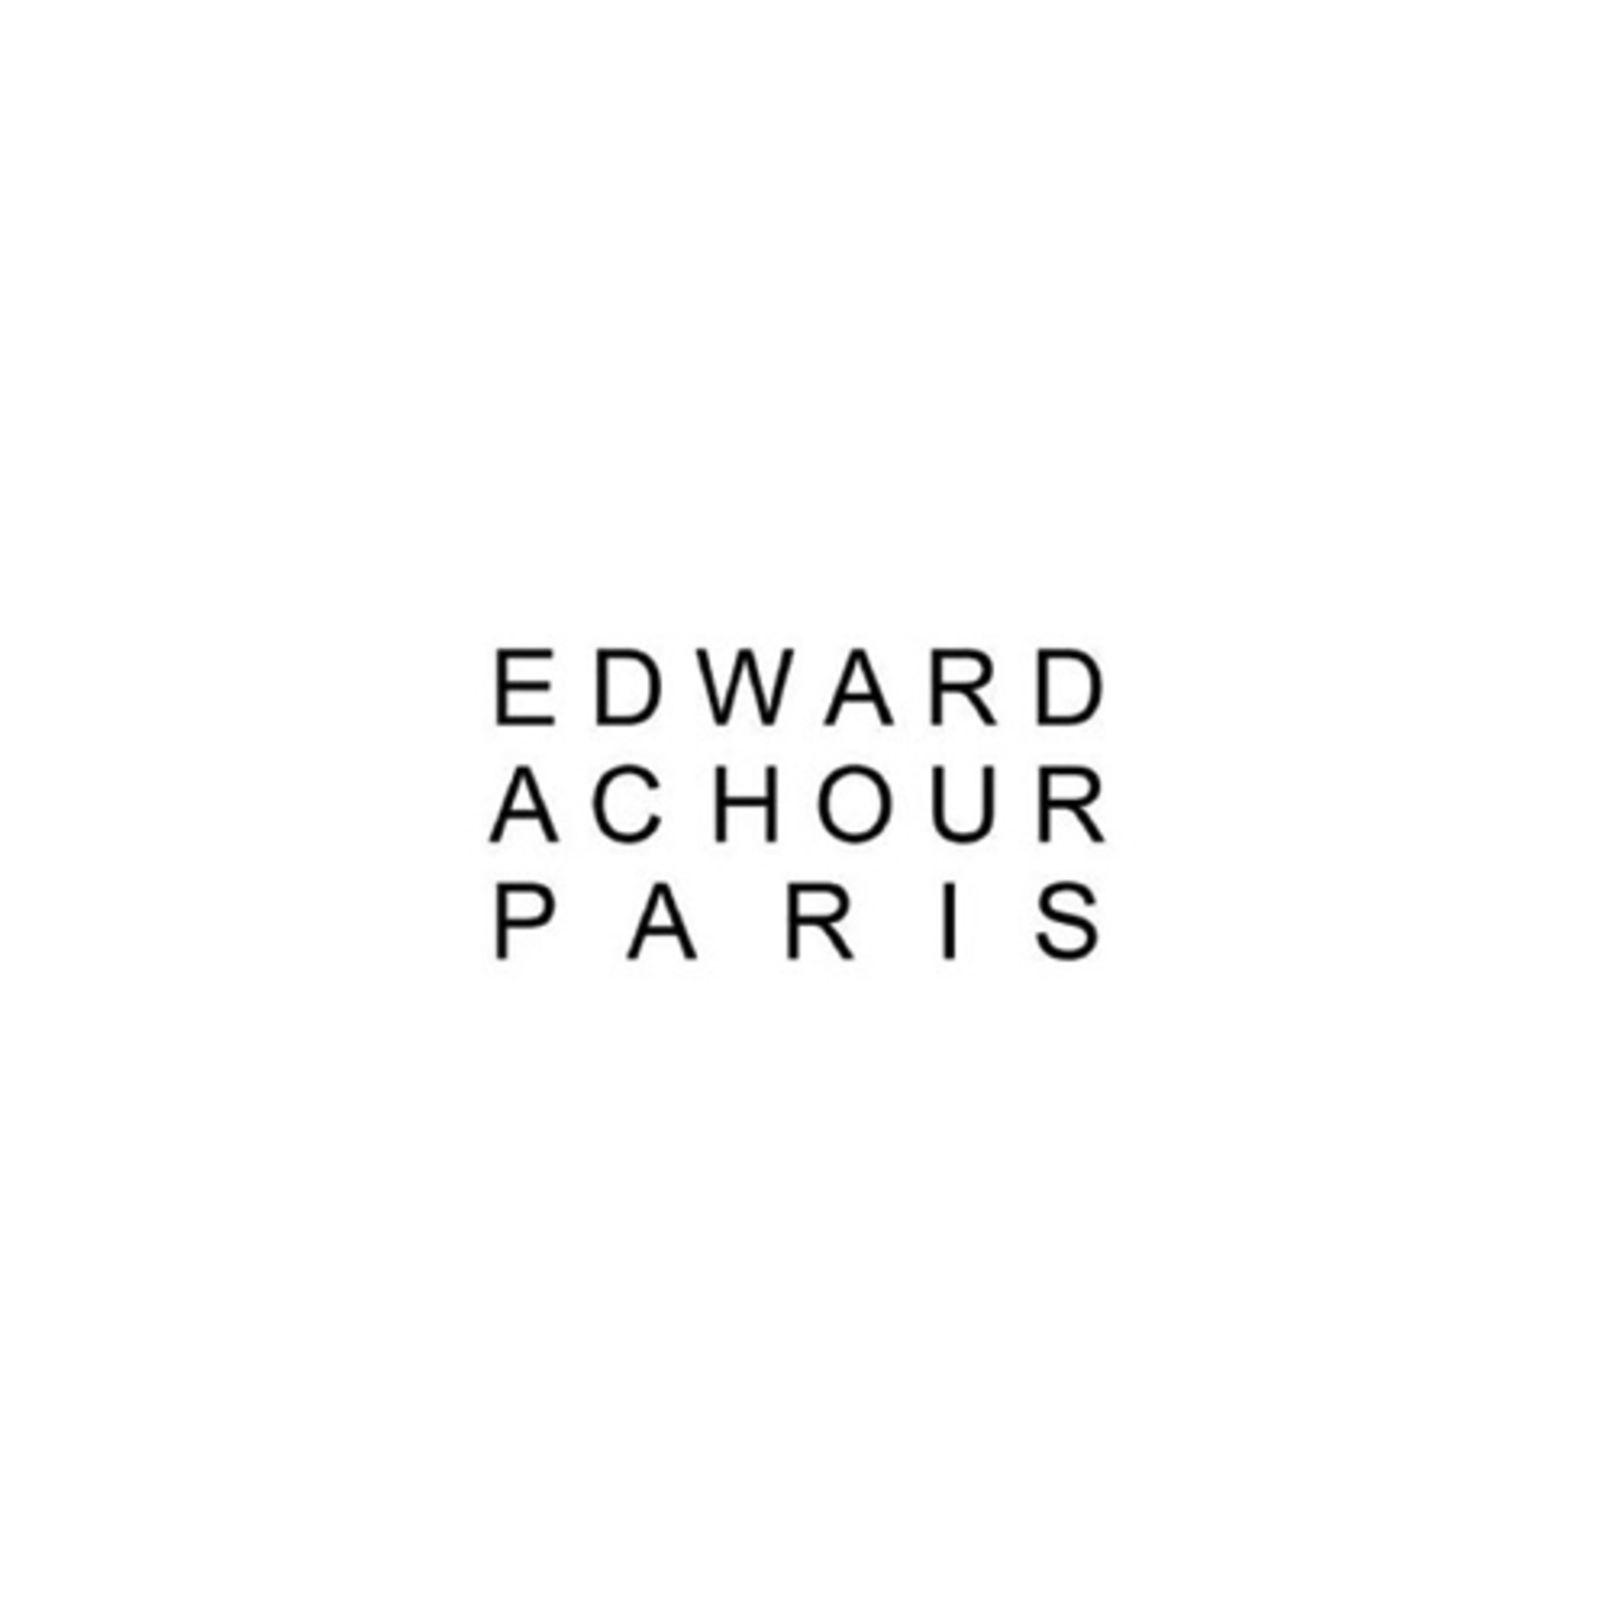 EDWARD ACHOUR